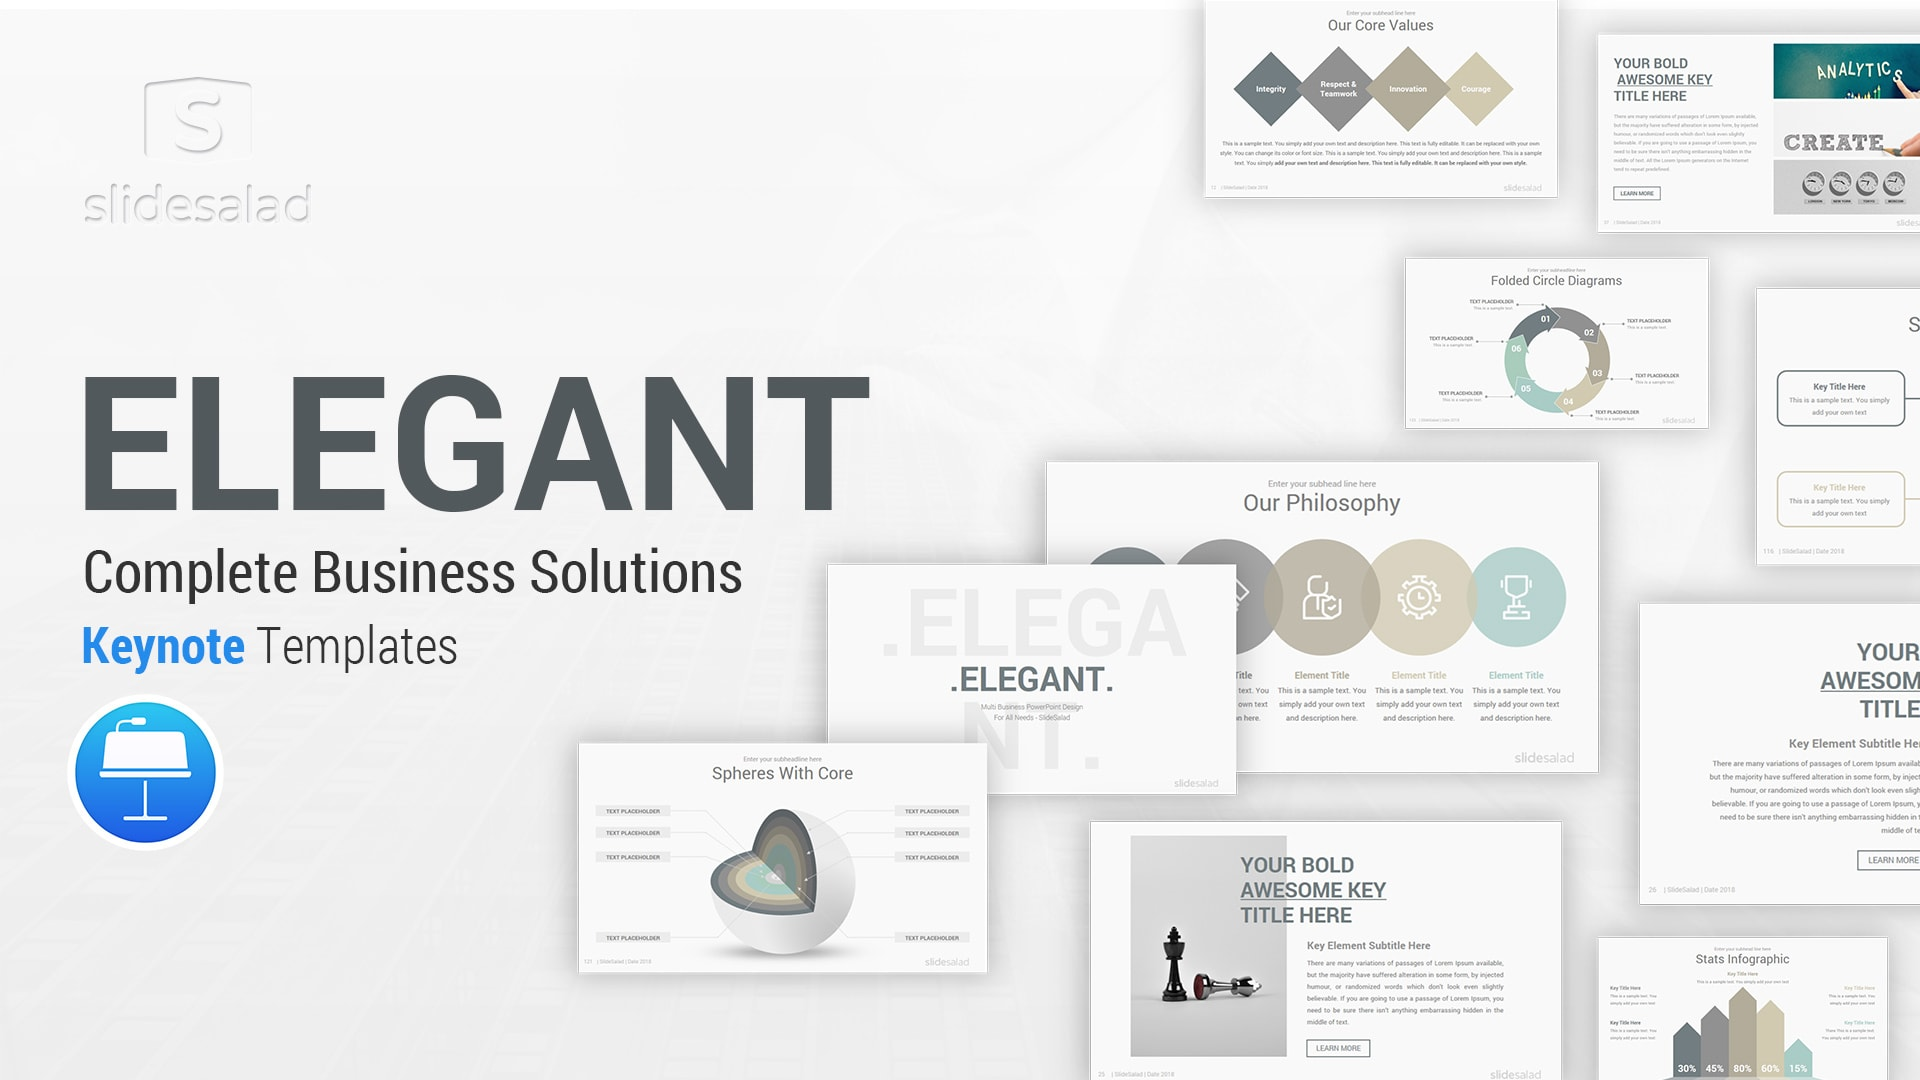 Elegant Keynote Template Designs – Minimal Mac Keynote Presentation Template